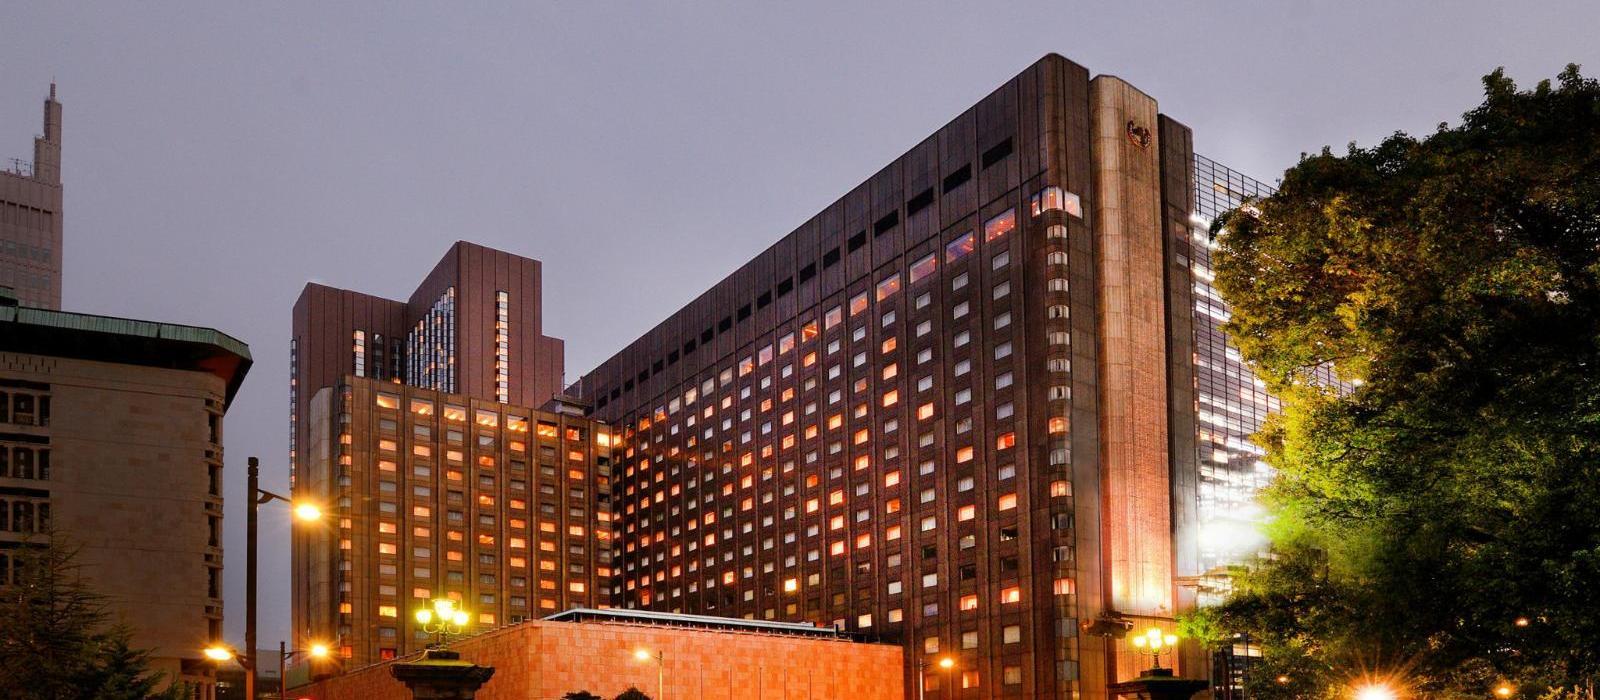 东京帝国酒店(Imperial Hotel, Tokyo) 图片  www.lhw.cn